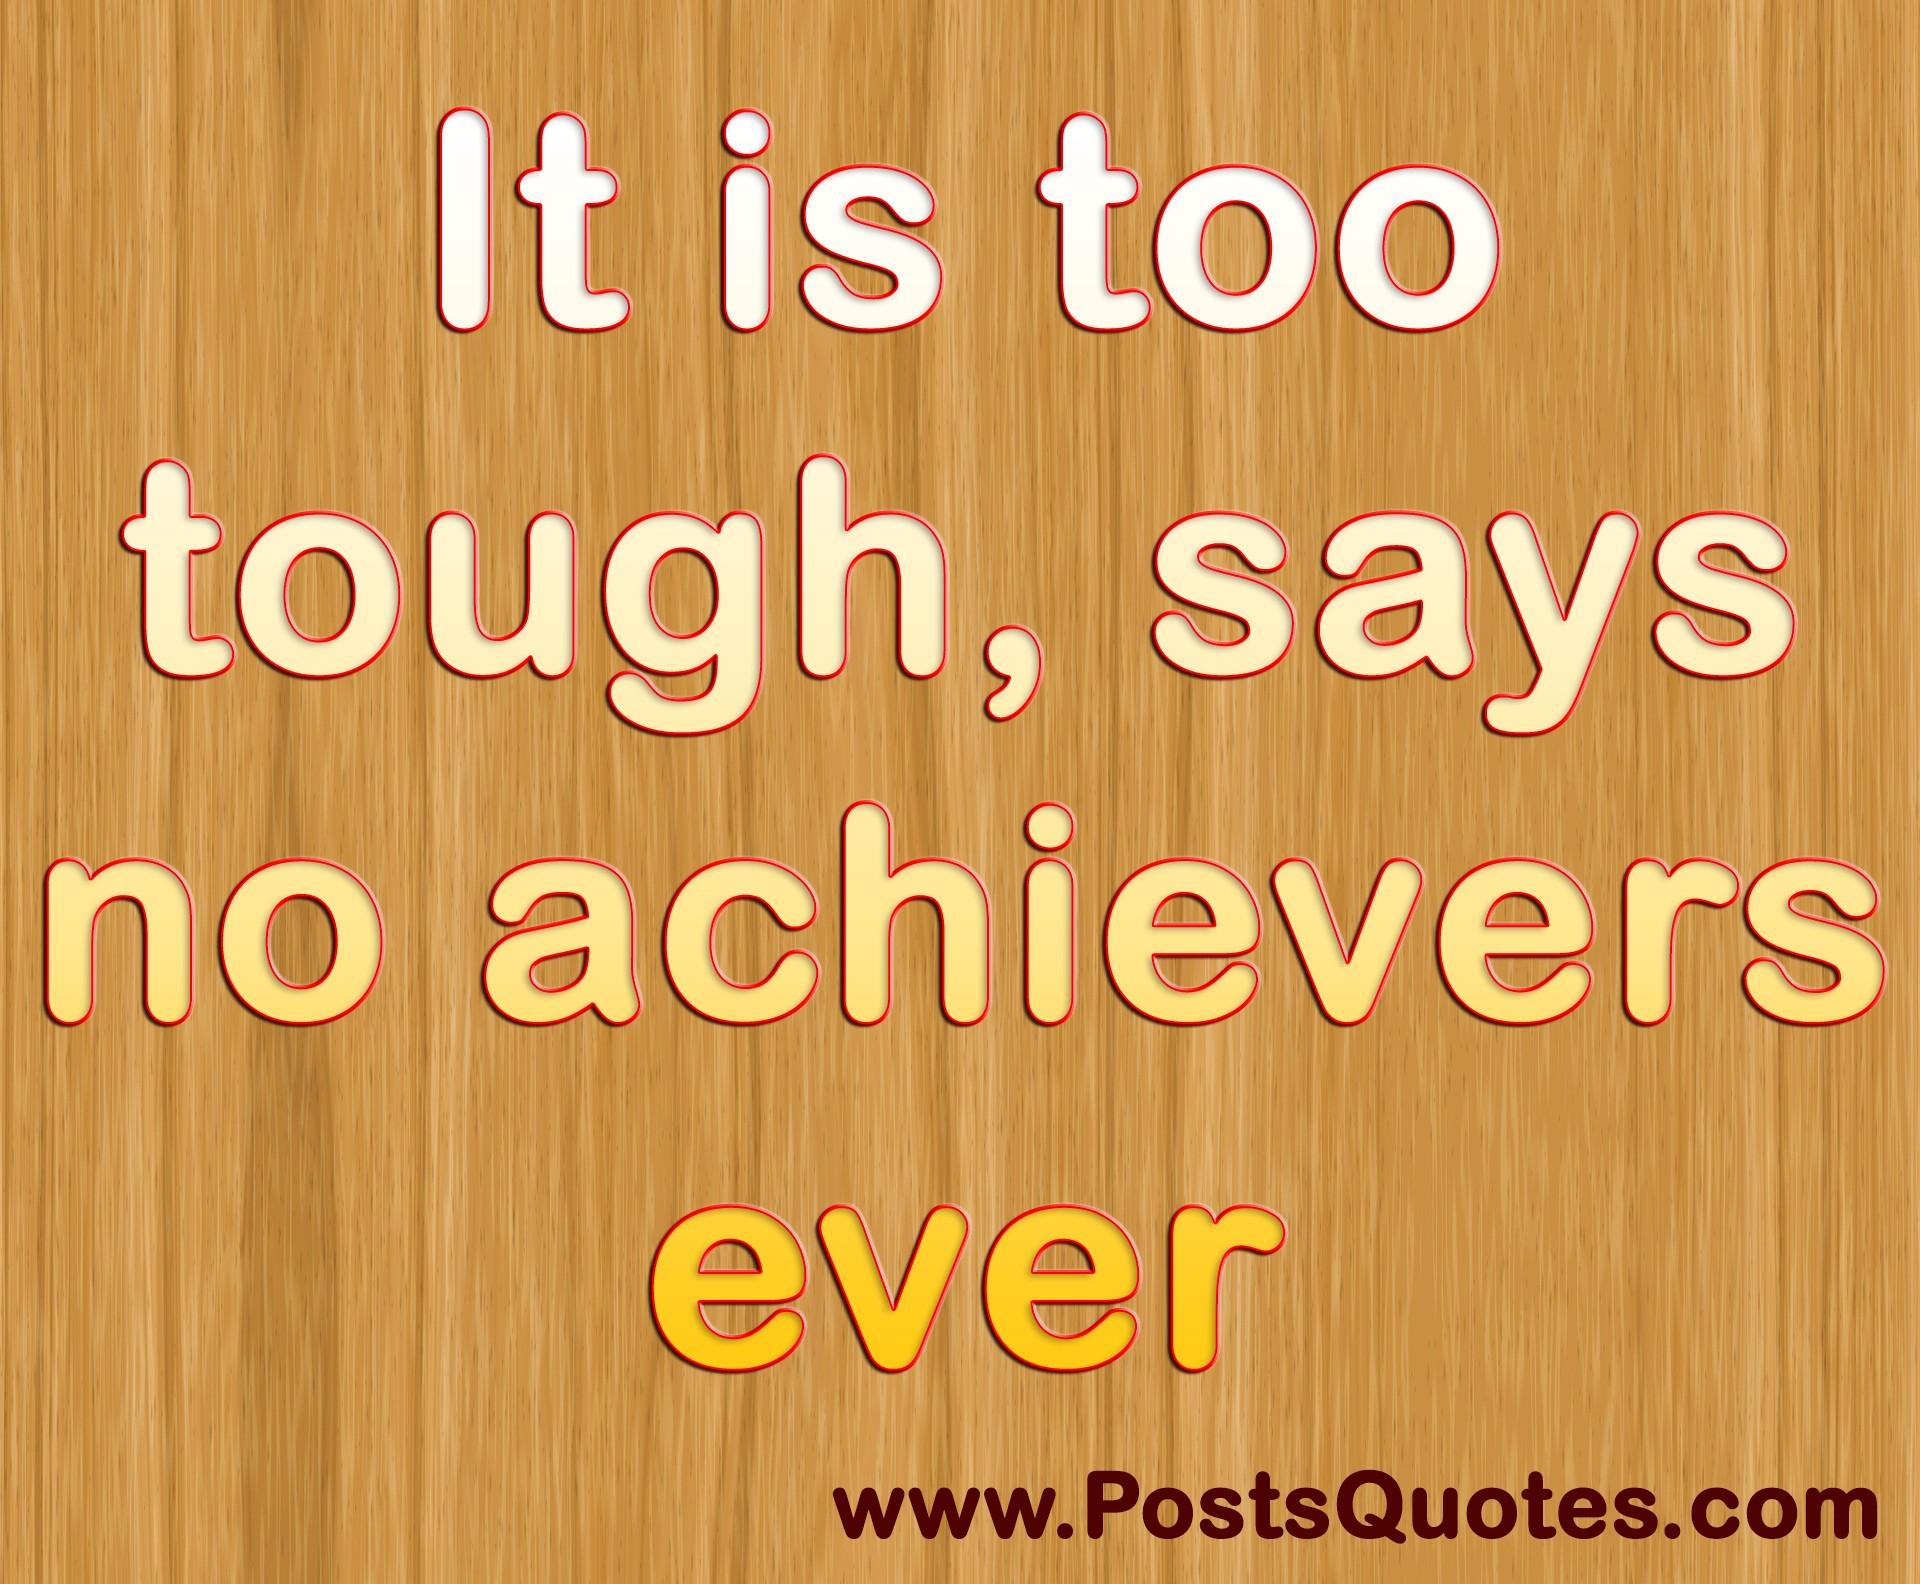 Amazing Uplifting Quotes